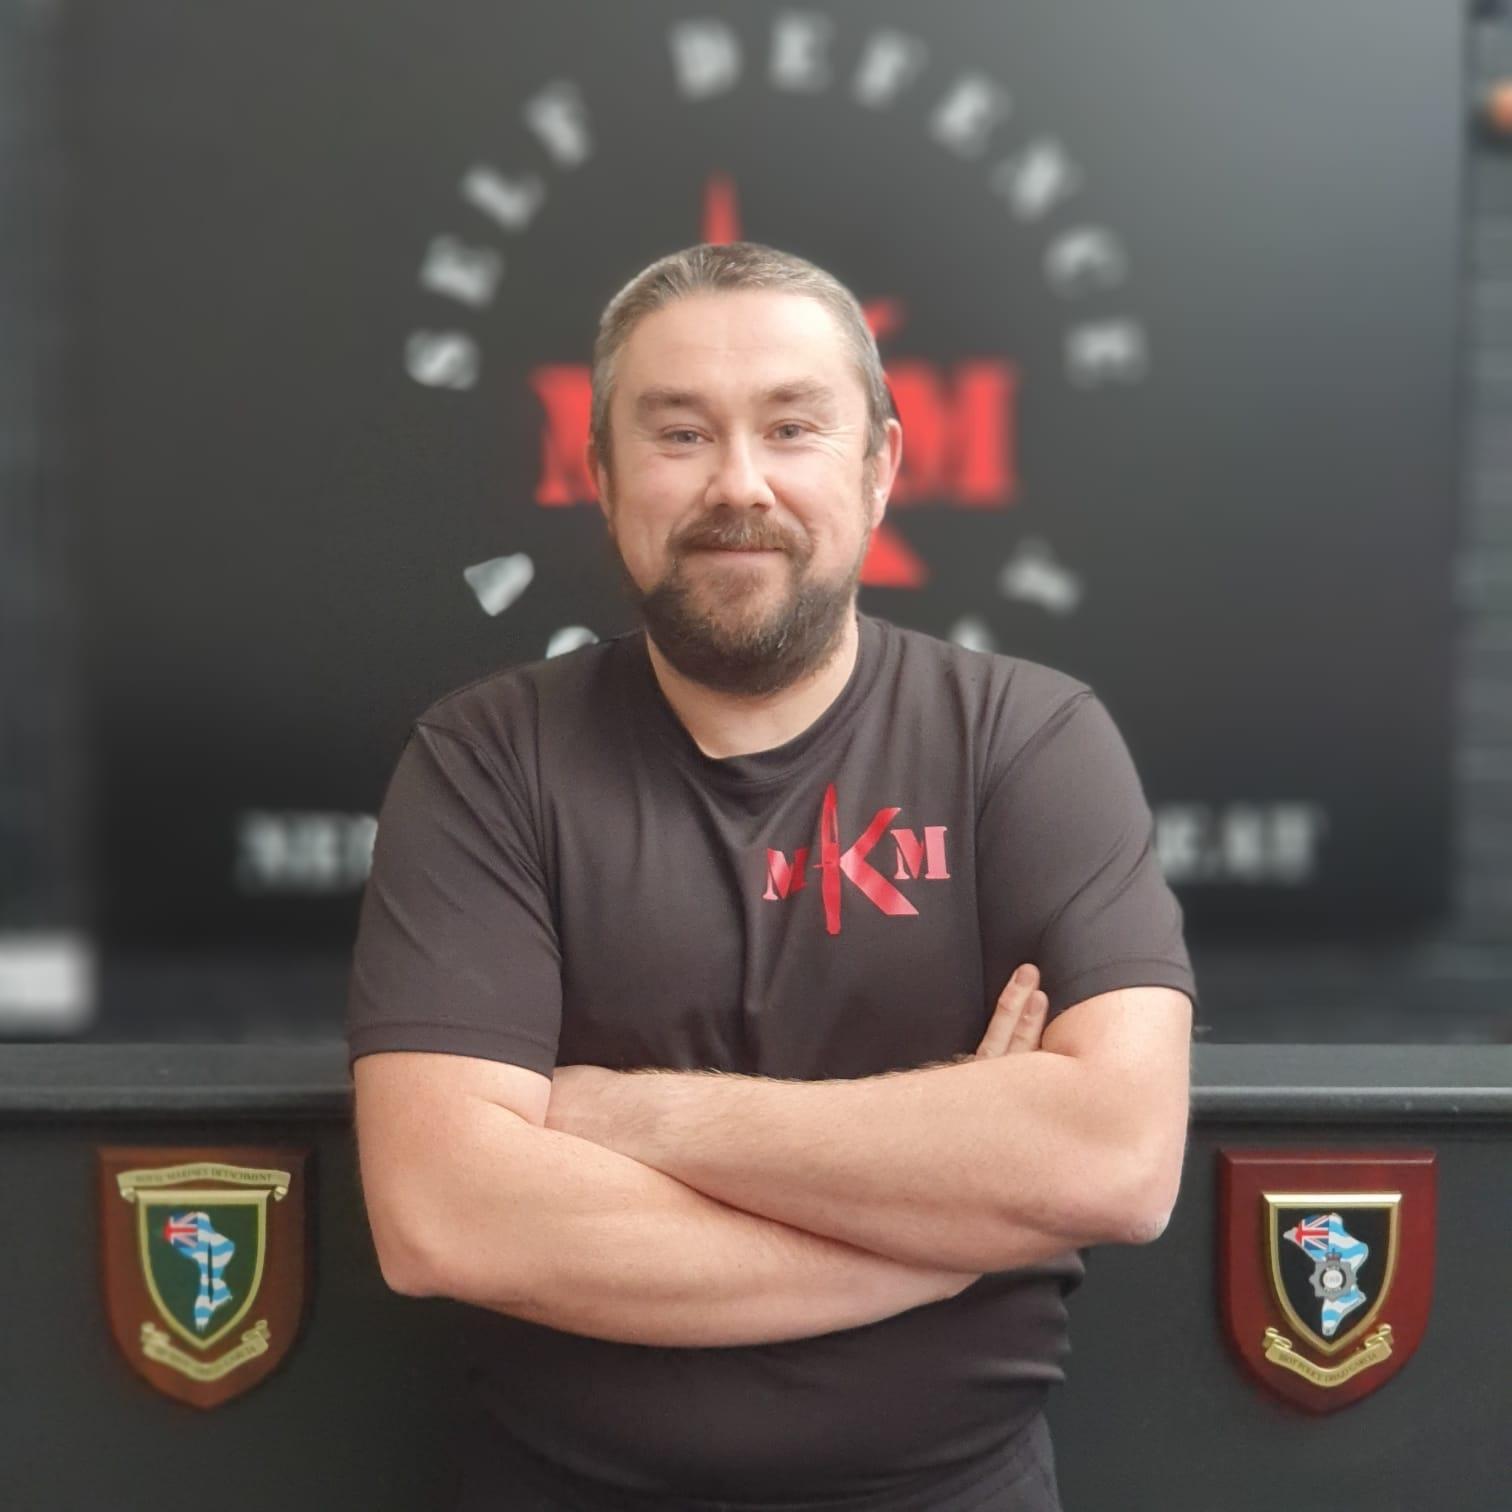 Simon Pridmore mkm instructor